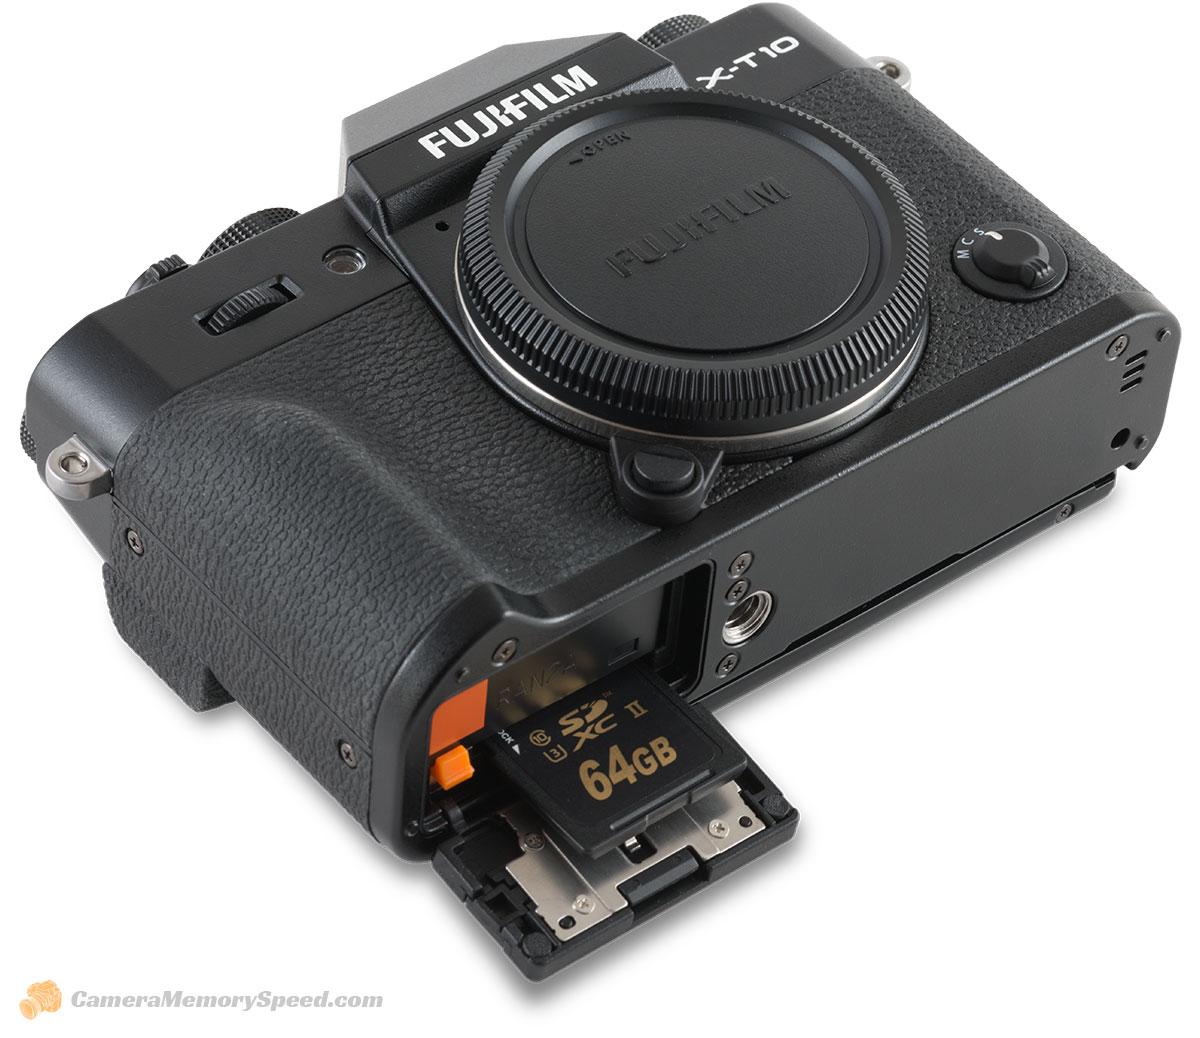 Nikon d800 sd card slot